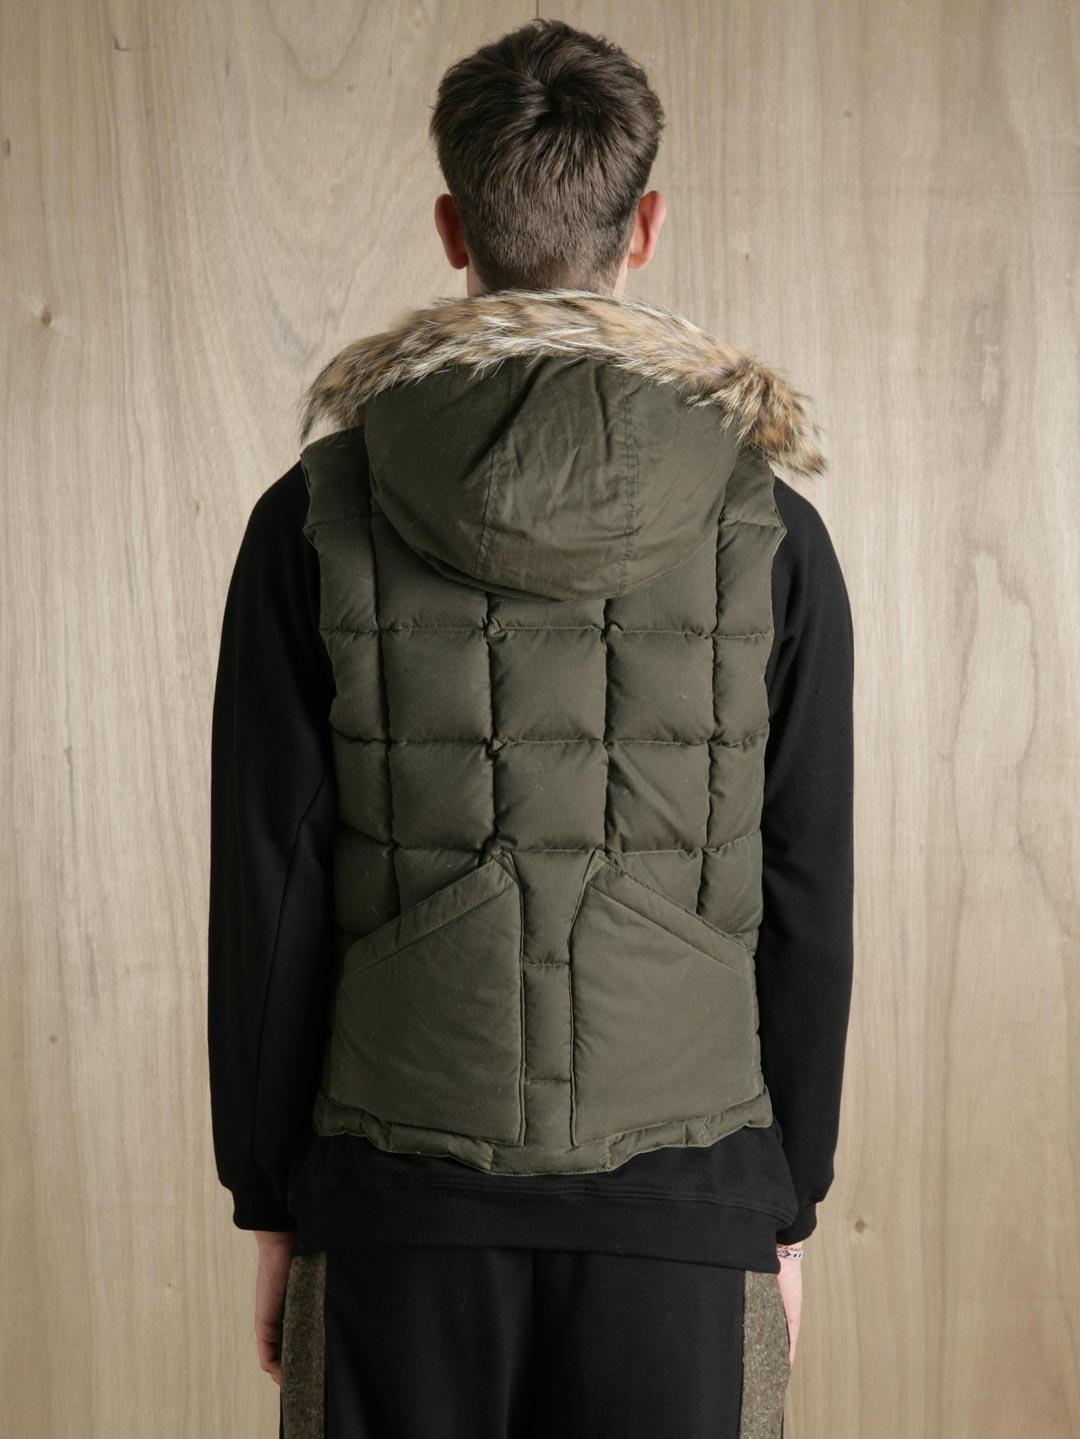 5214b6c2636c Lyst - Nigel Cabourn X Eddie Bauer Men S Goose Down And Coyote Fur Desert  Wax Vest in Green for Men